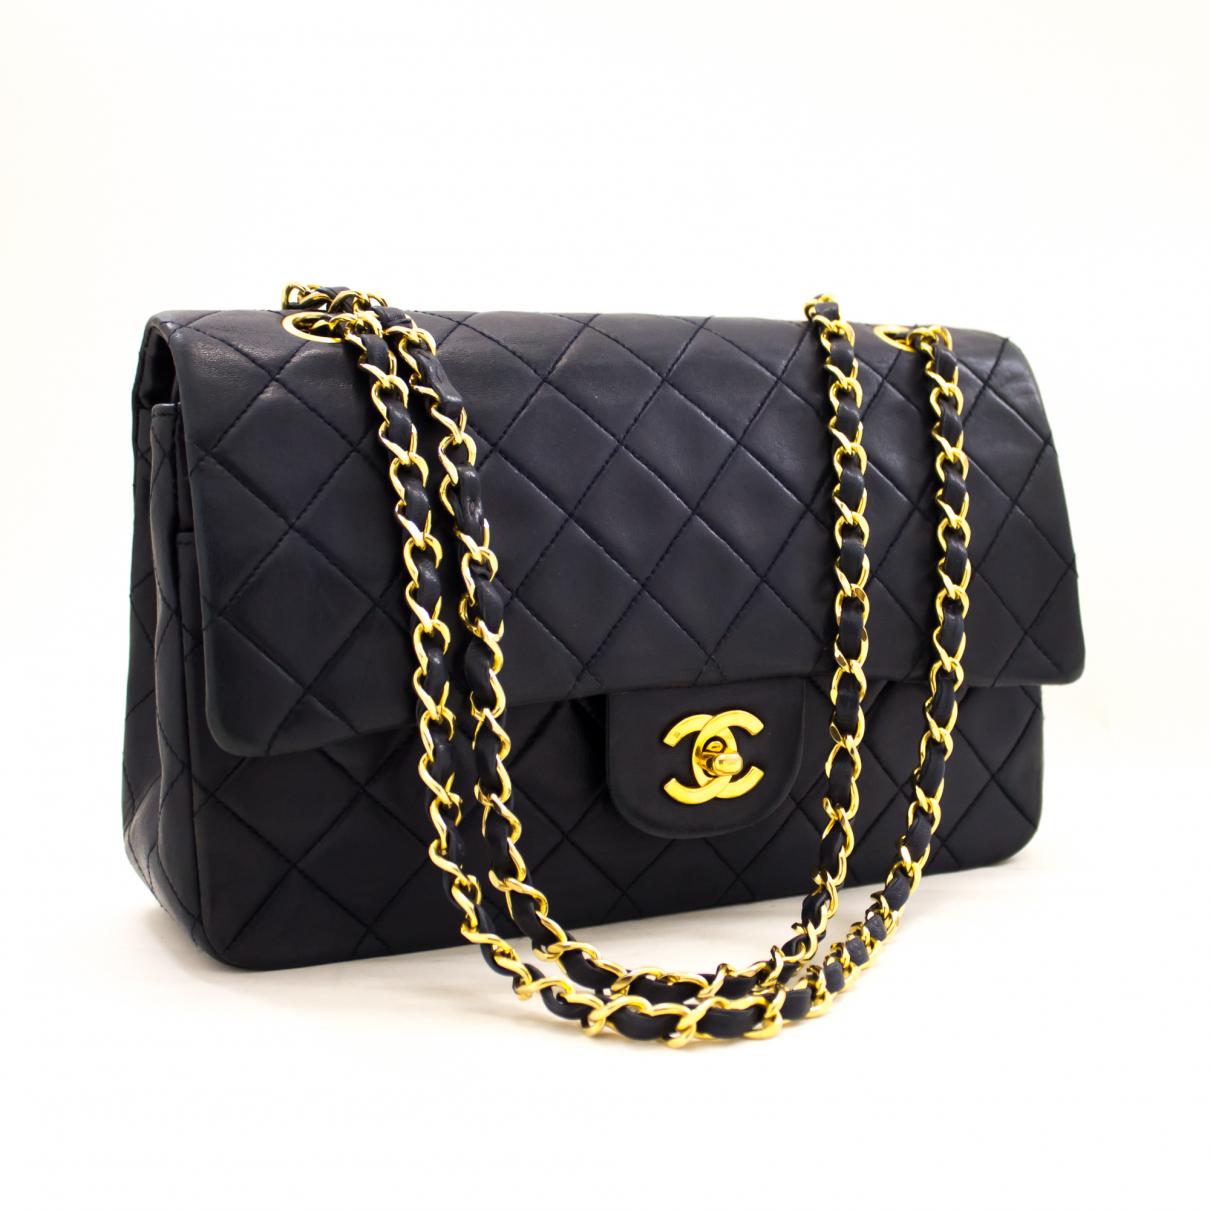 Chanel \N Navy Leather handbag for Women \N